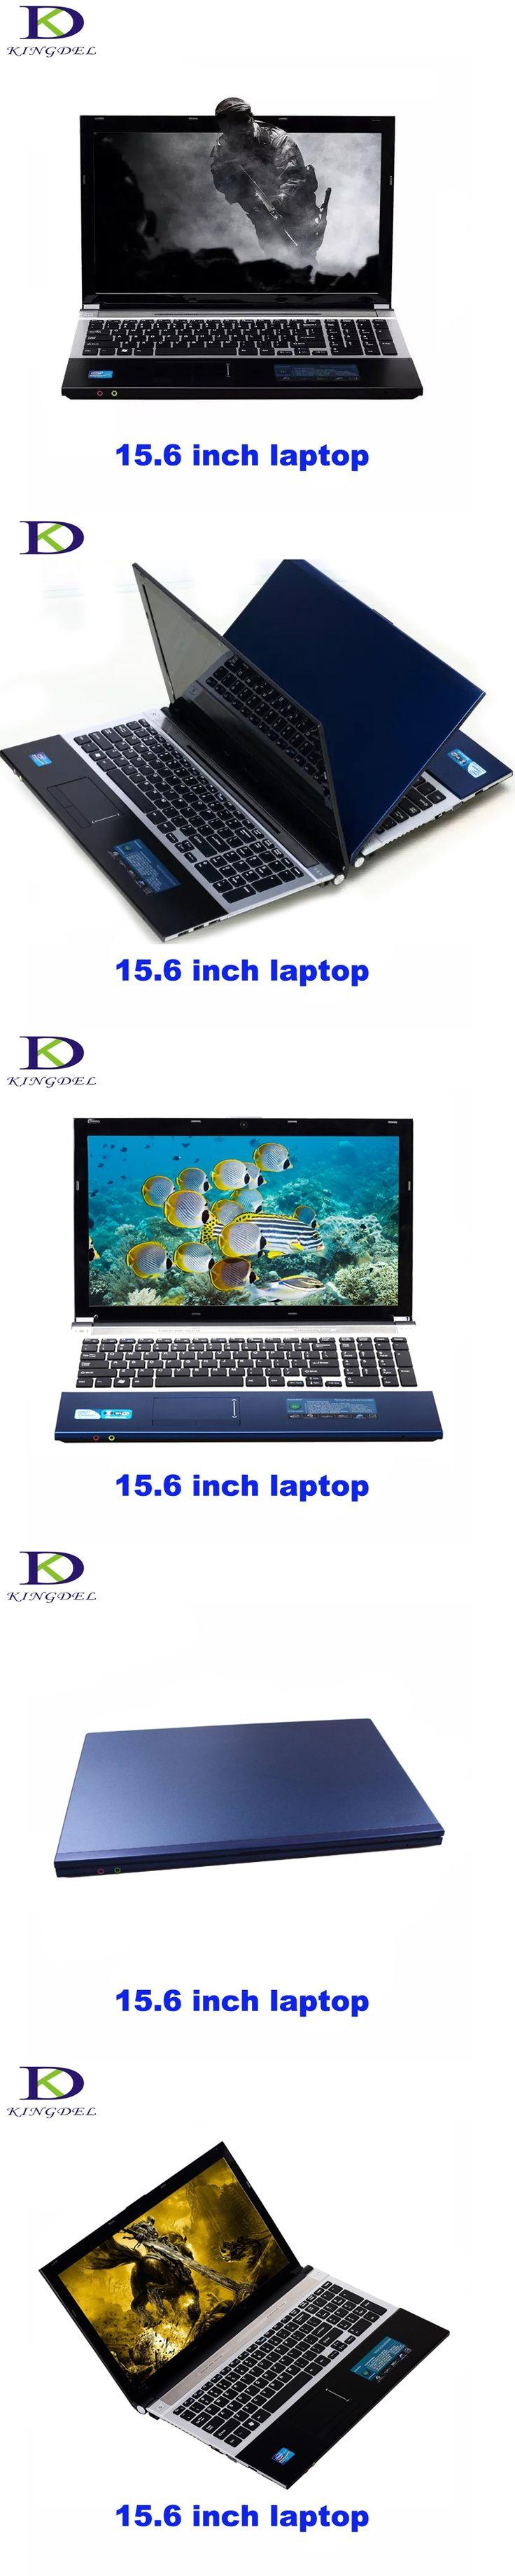 Newest 15.6 Inch Bluetooth Laptop Intel Core i7-3537U Netbook Computer 8GB RAM 1TB HDD Windows 7 SATA Intel HD Graphics 4000